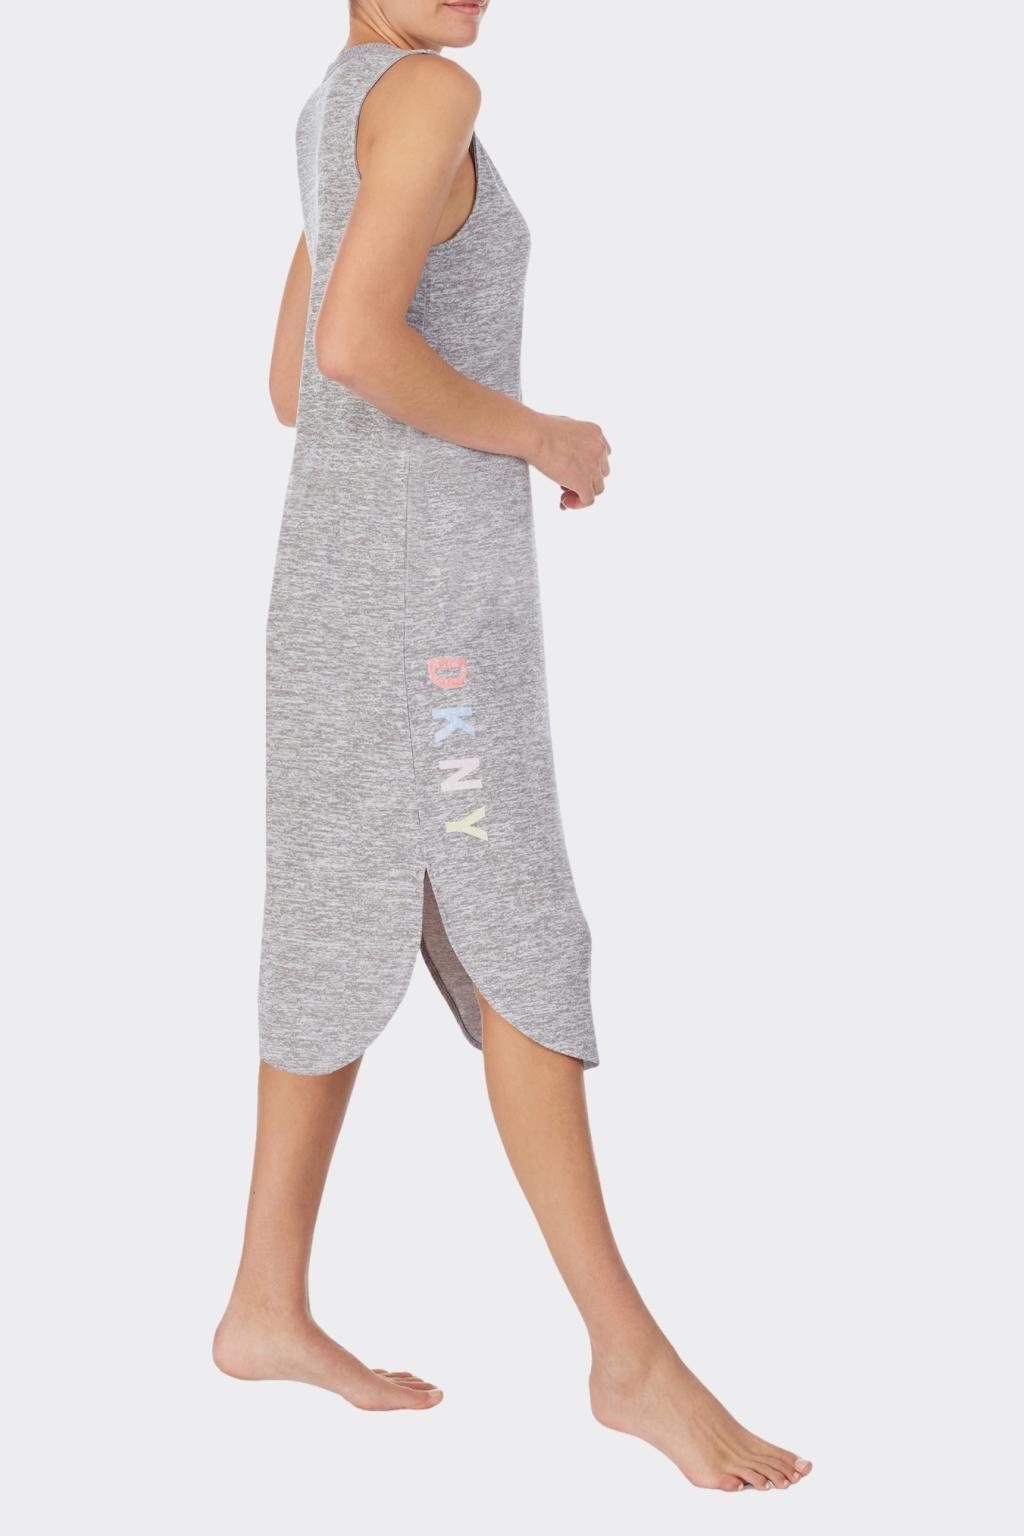 DKNY dámské volnočasové šaty s viskózou - šedé